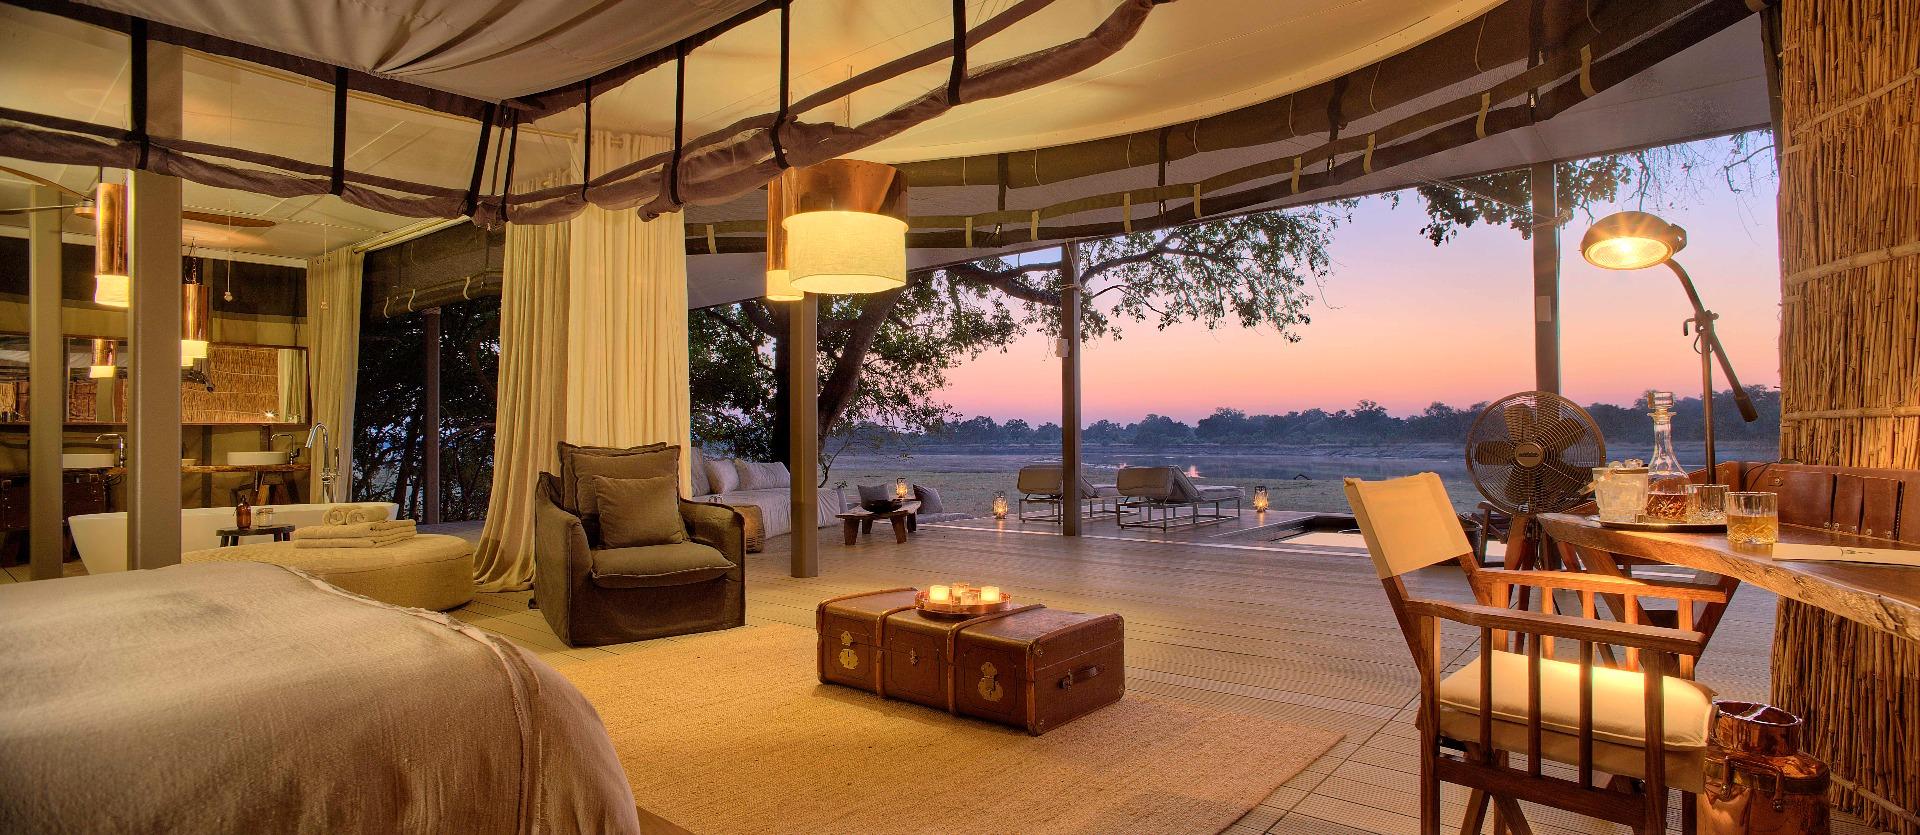 Chinzombo - View from the Villa